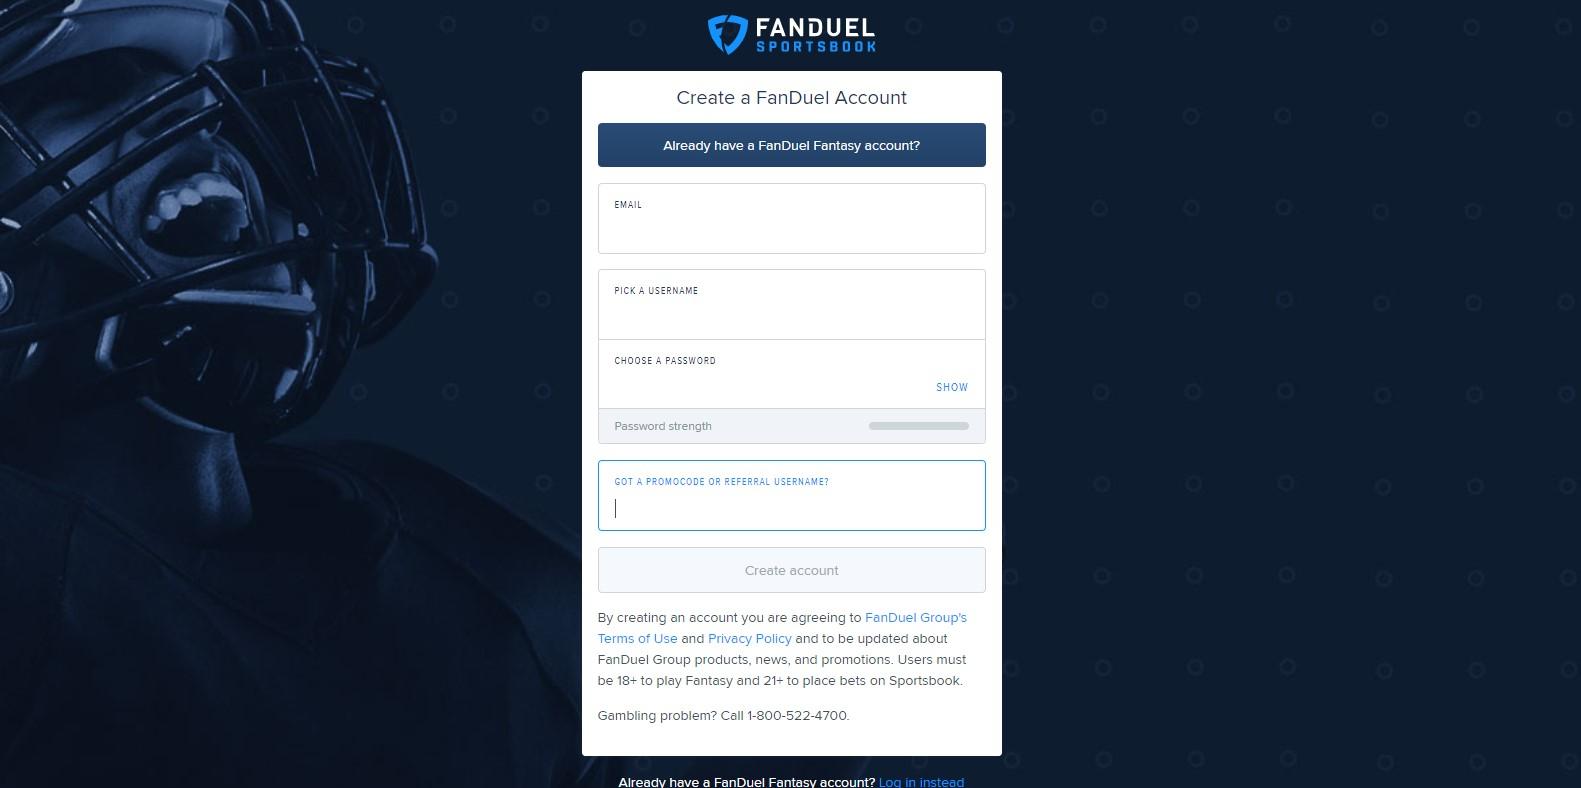 fanduel promo code step 2